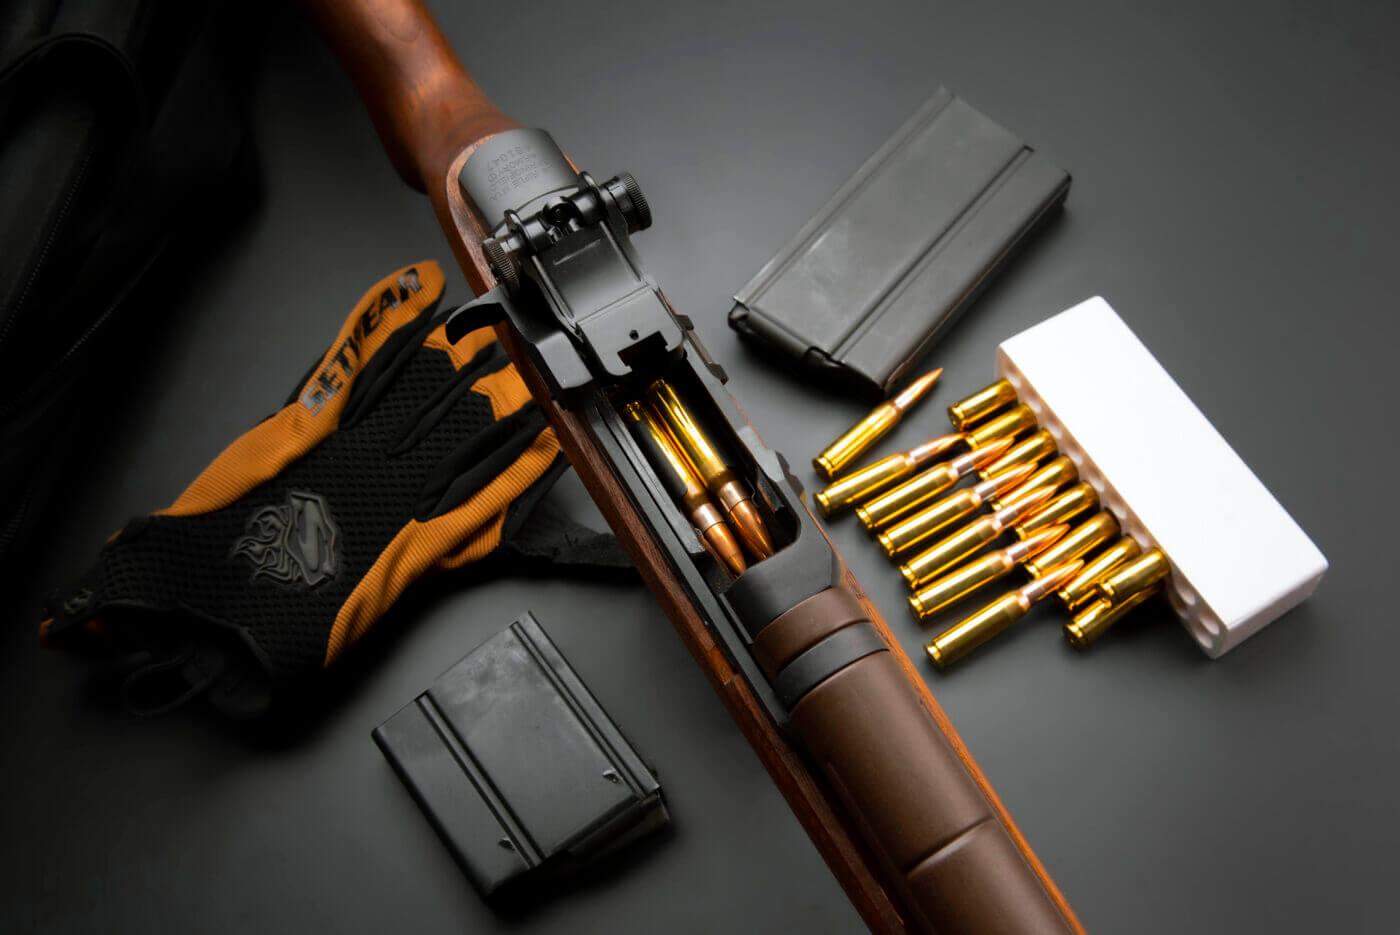 Handloading ammo for semi-automatic rifles